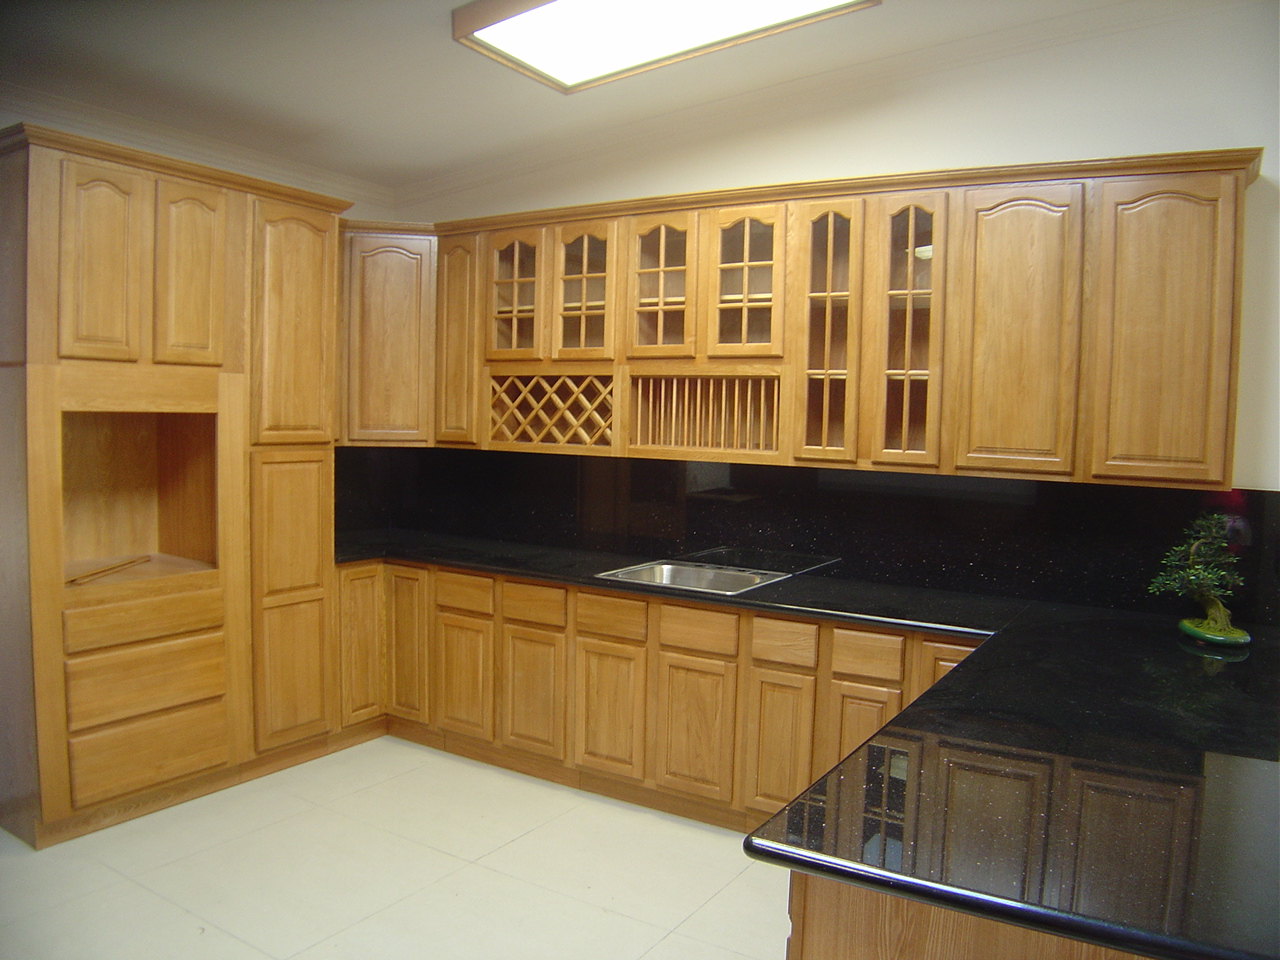 Kitchen pantry closet photo - 1